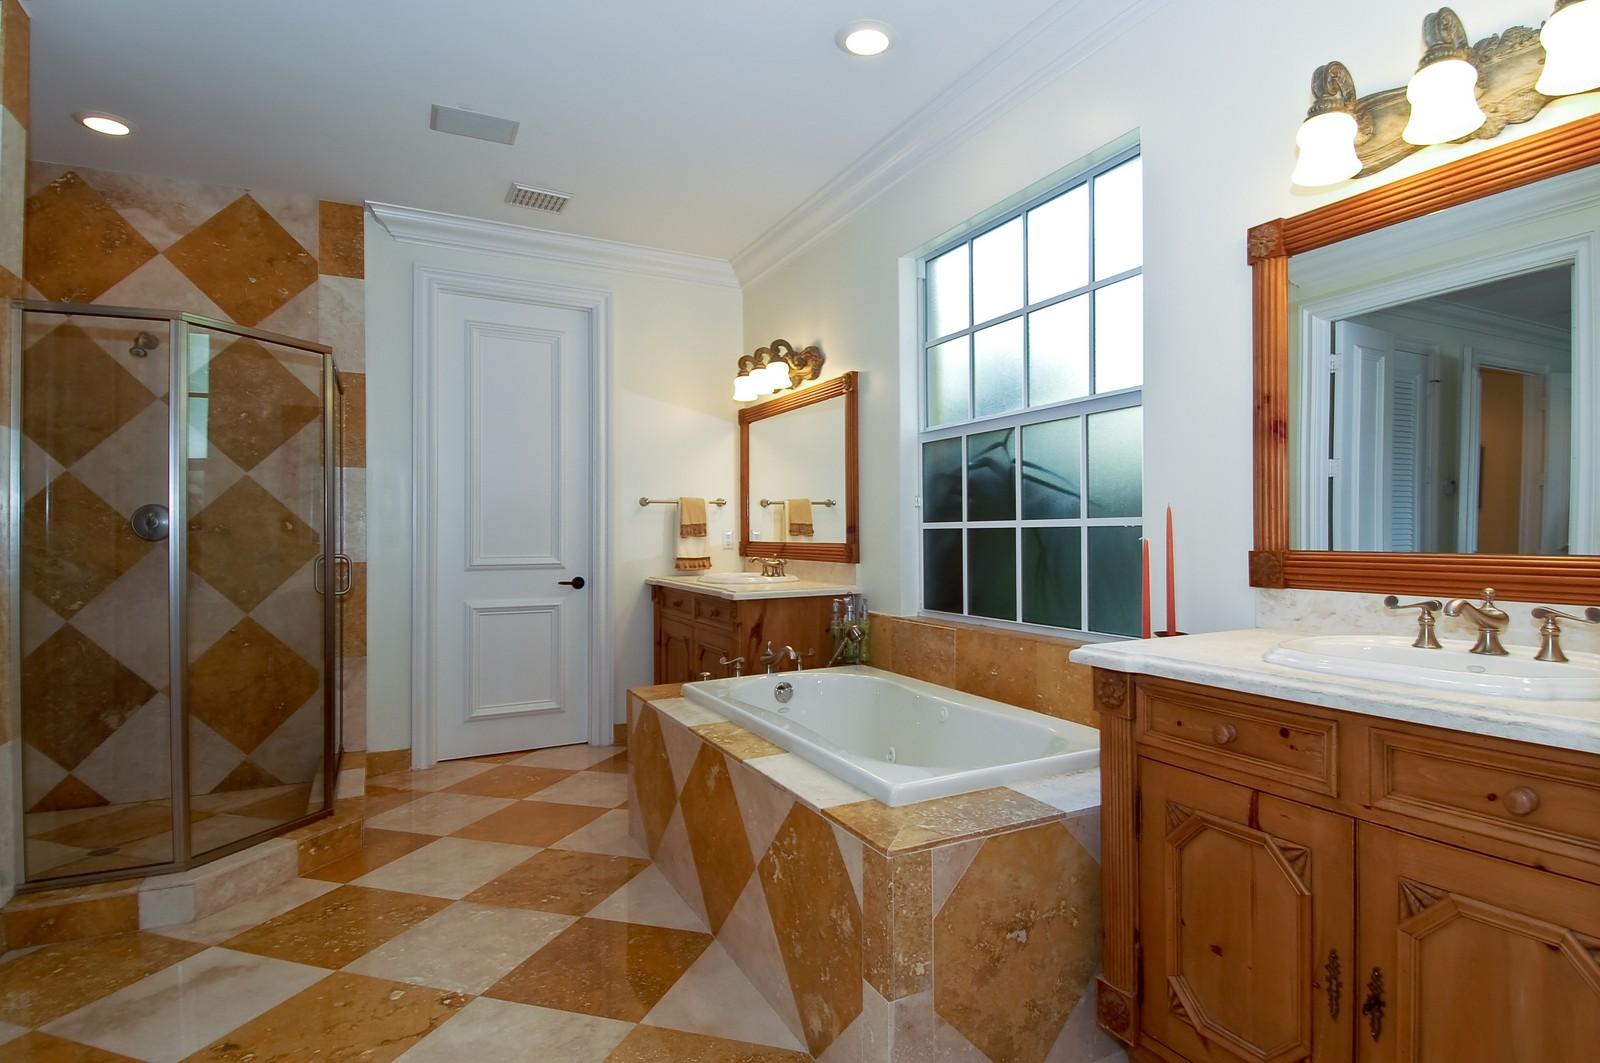 Real Estate Photography - 355 NE 3rd Ct, Boca Raton, FL, 33432 - Master Bathroom